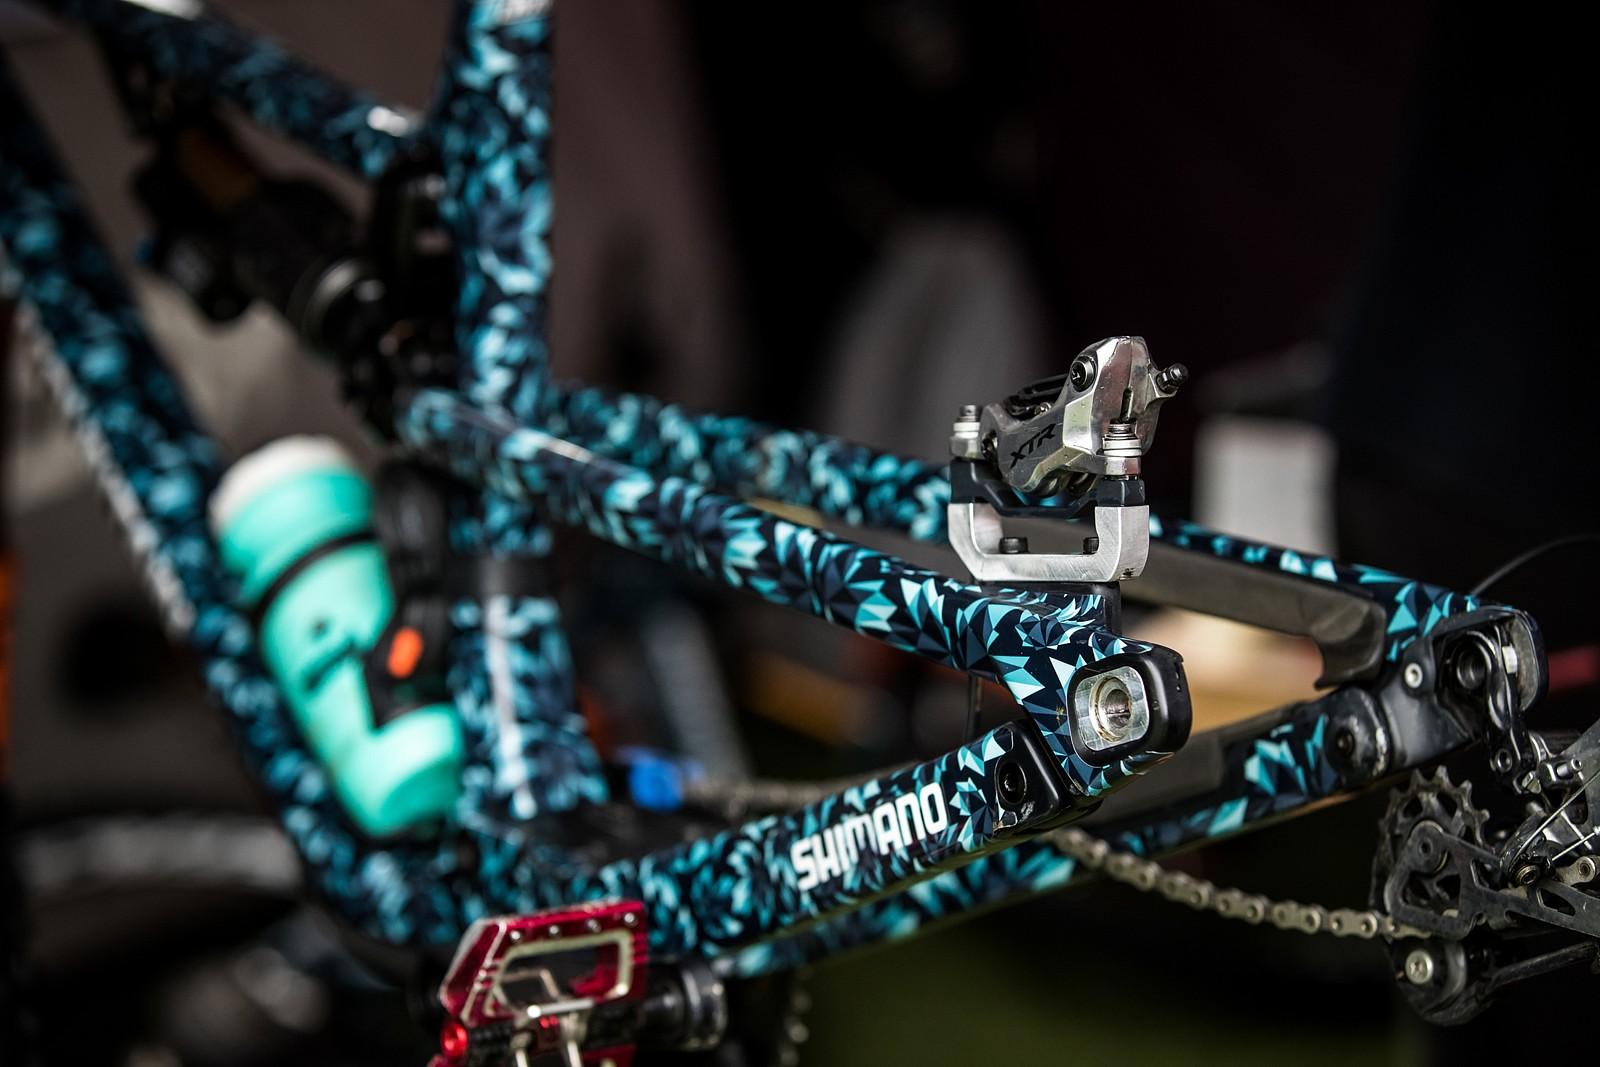 Camouflage - PIT BITS - Enduro World Series, Zermatt - Mountain Biking Pictures - Vital MTB